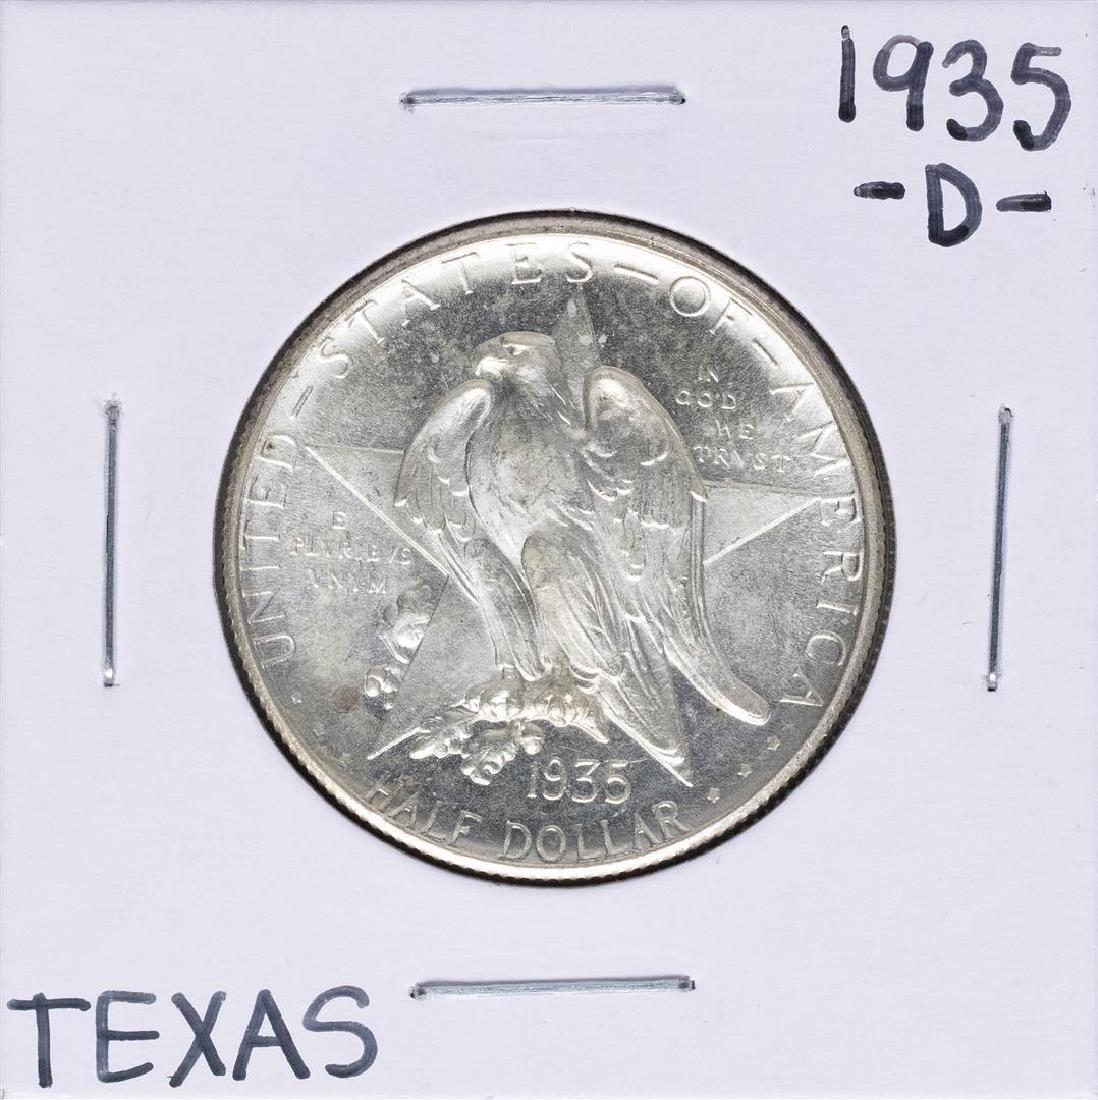 1935-D Texas Independence Centennial Commemorative Half